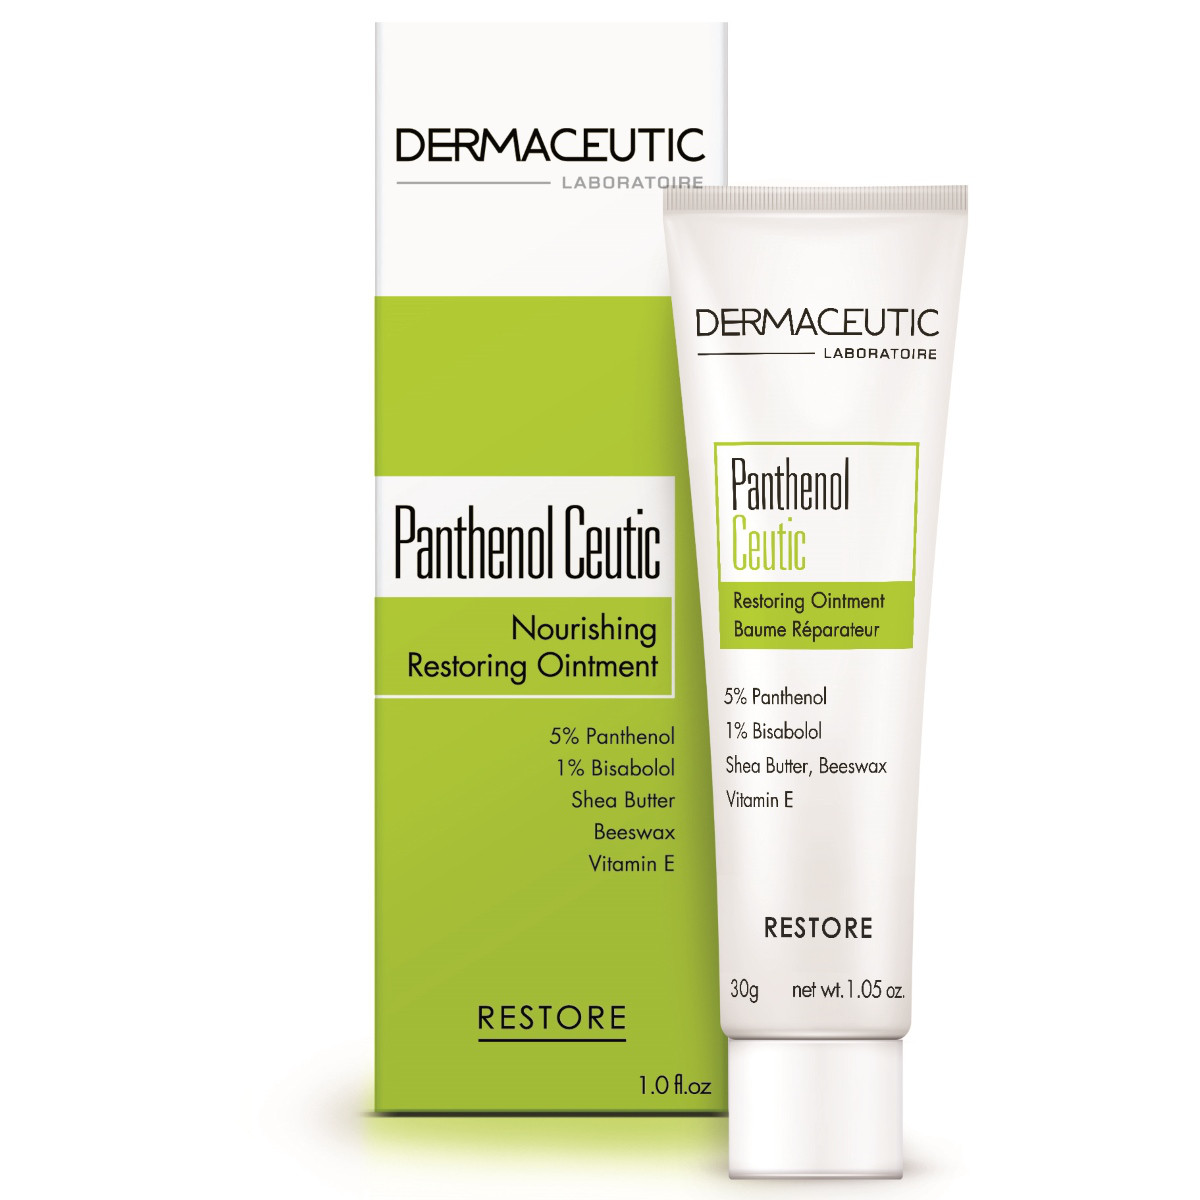 Dermaceutic Восстанавливающий бальзам Panthenol Ceutic,30г